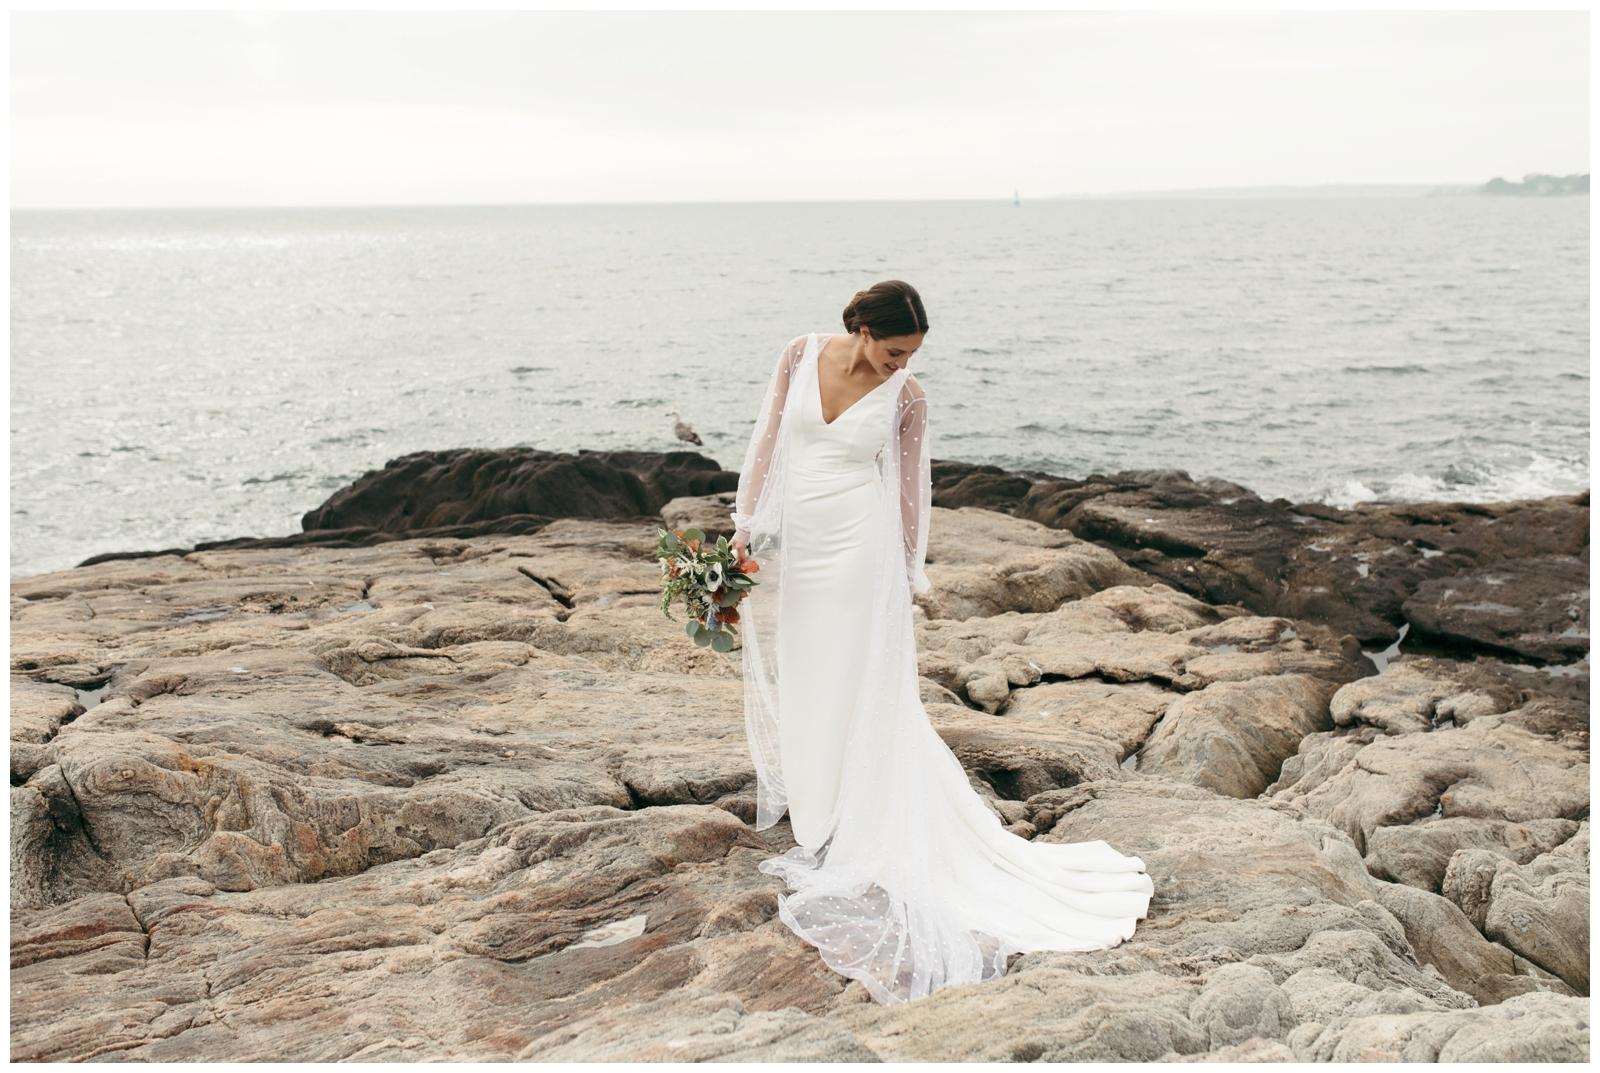 Madison-Beach-Hotel-Wedding-Bailey-Q-Photo-Boston-Wedding-Photographer-009.jpg